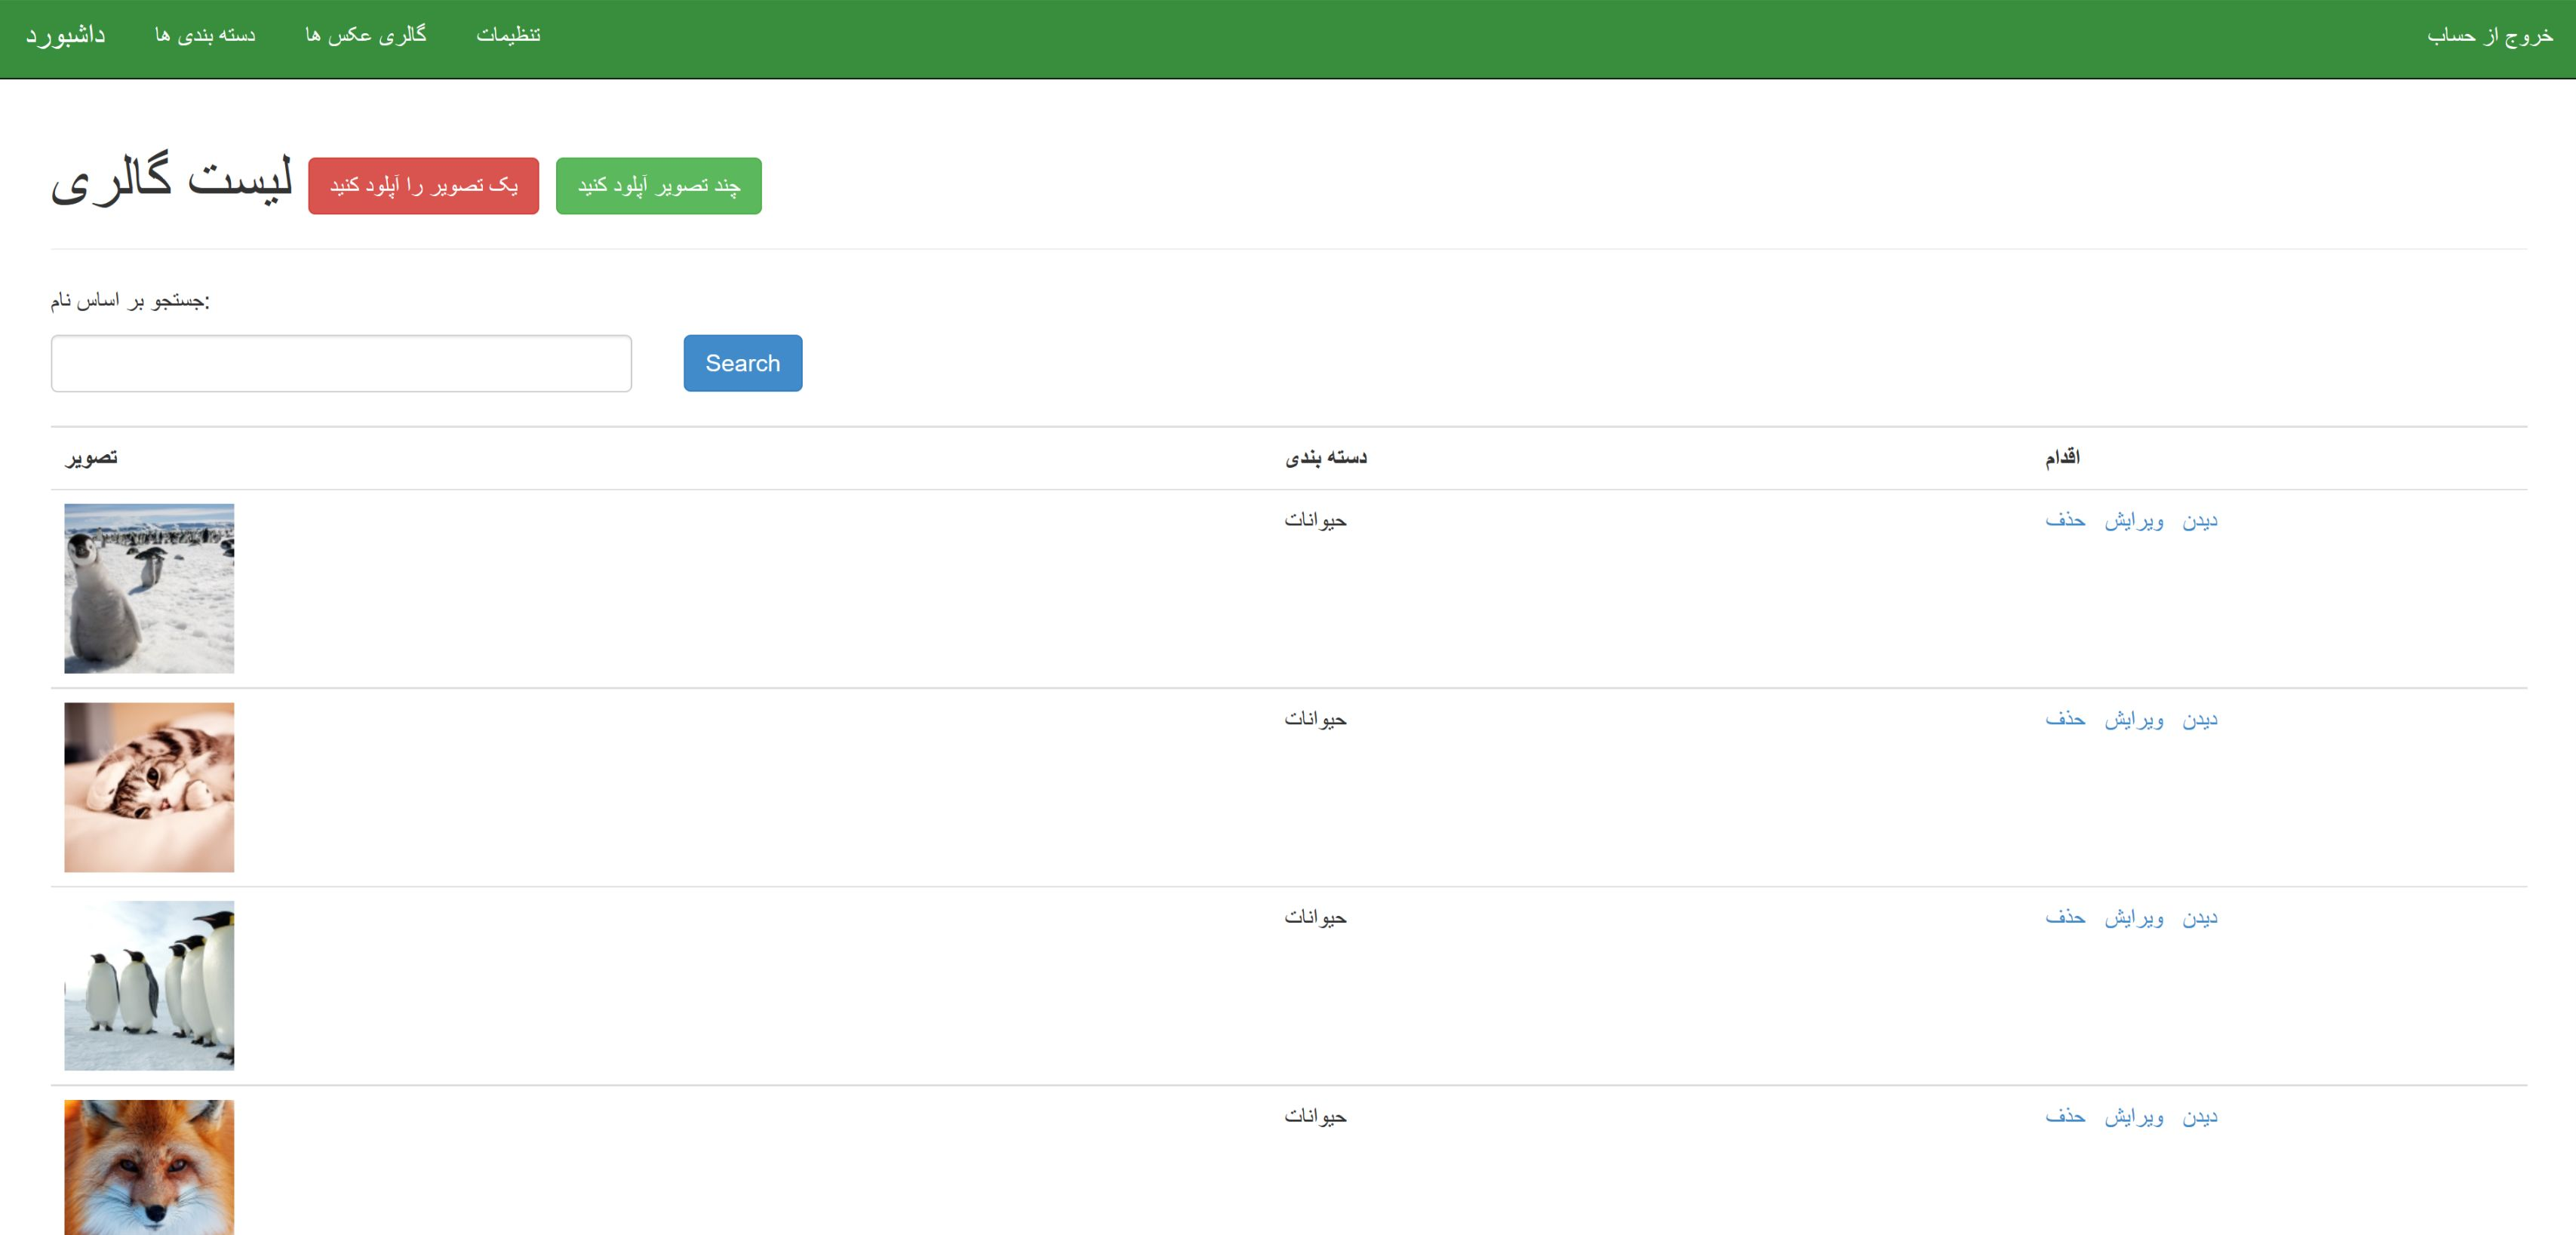 سورس اپلیکیشن والپیپر آنلاین – همراه با پنل مدیریت